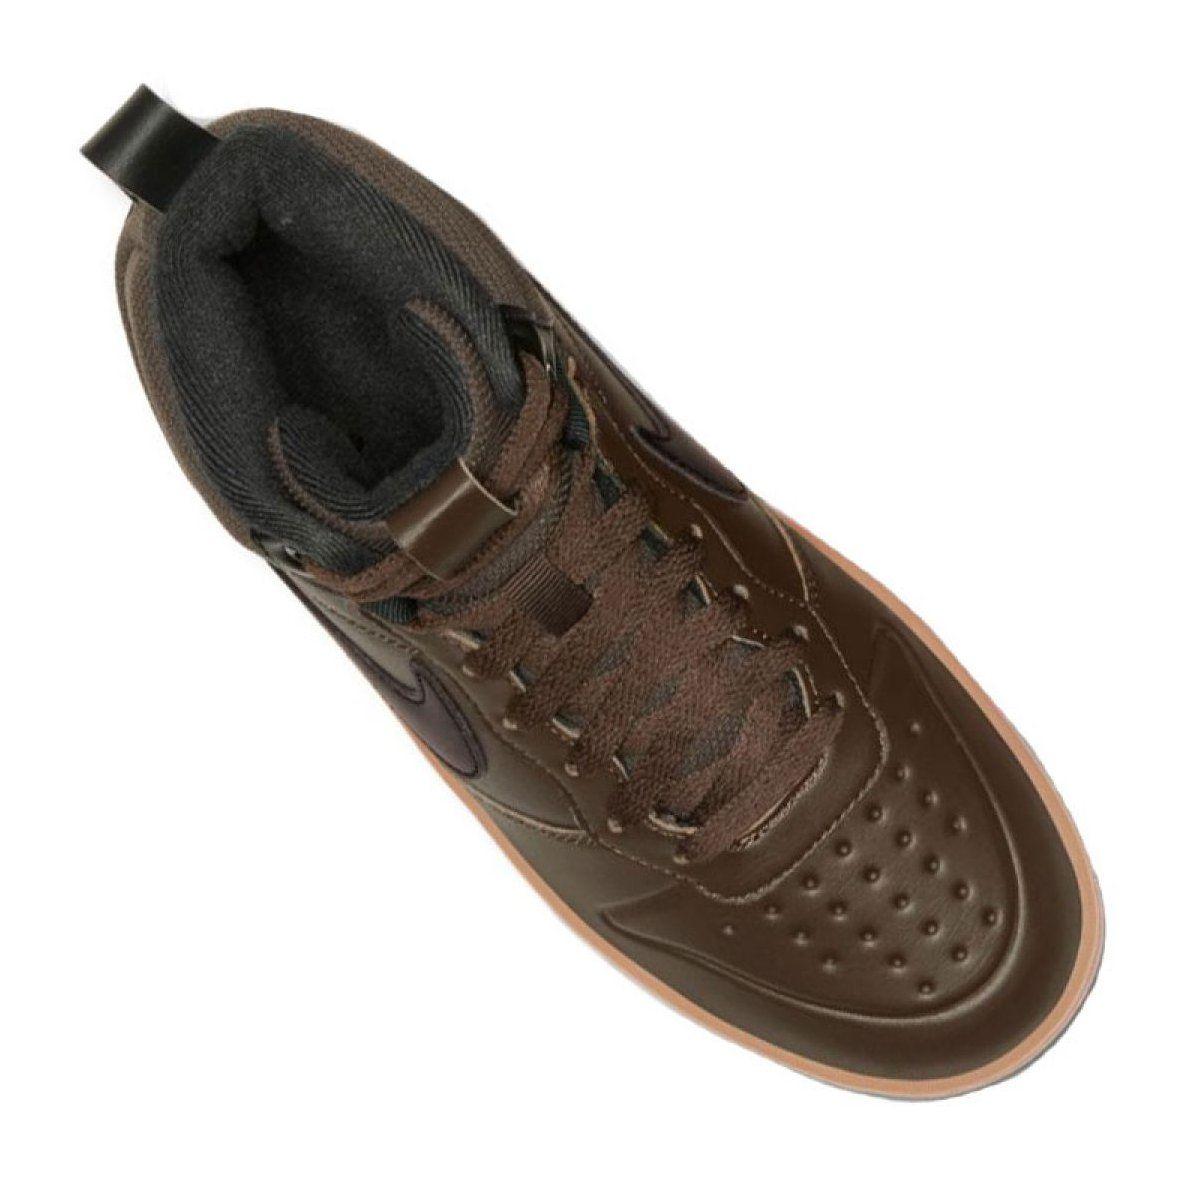 Nike Court Borough Mid 2 Boot Gs Jr Bq5440 200 Shoes Black Junior Shoes Black Shoes Nike Shoes Women